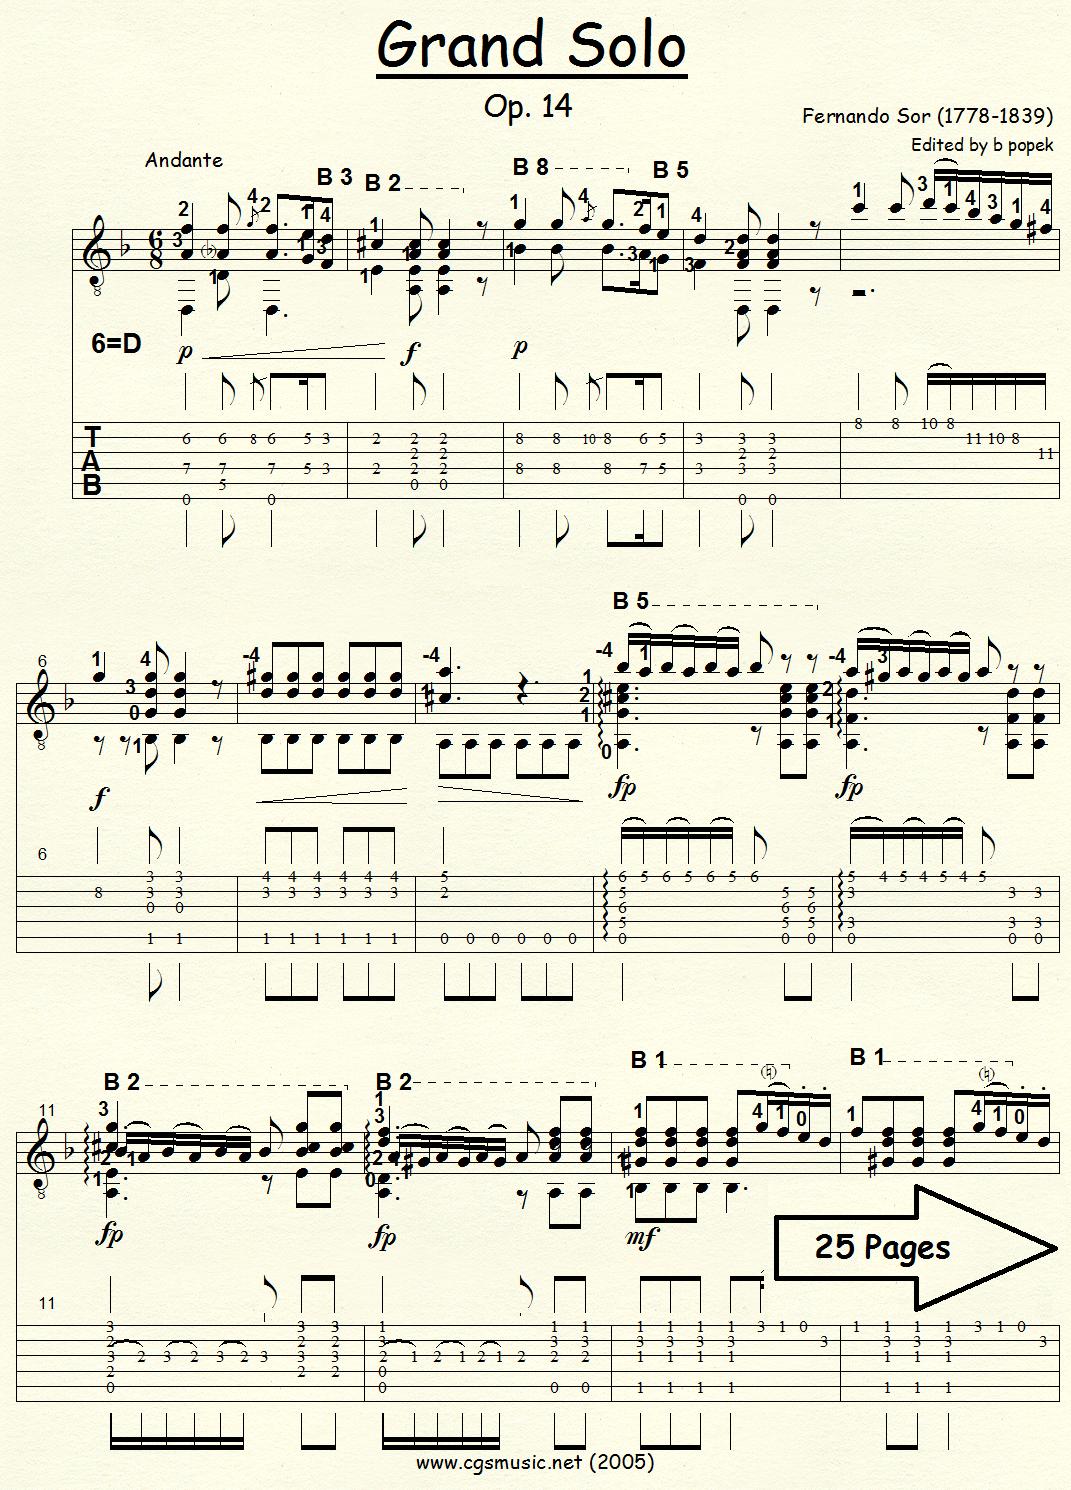 Grand Solo Op 14 (Sor) for Classical Guitar in Tablature